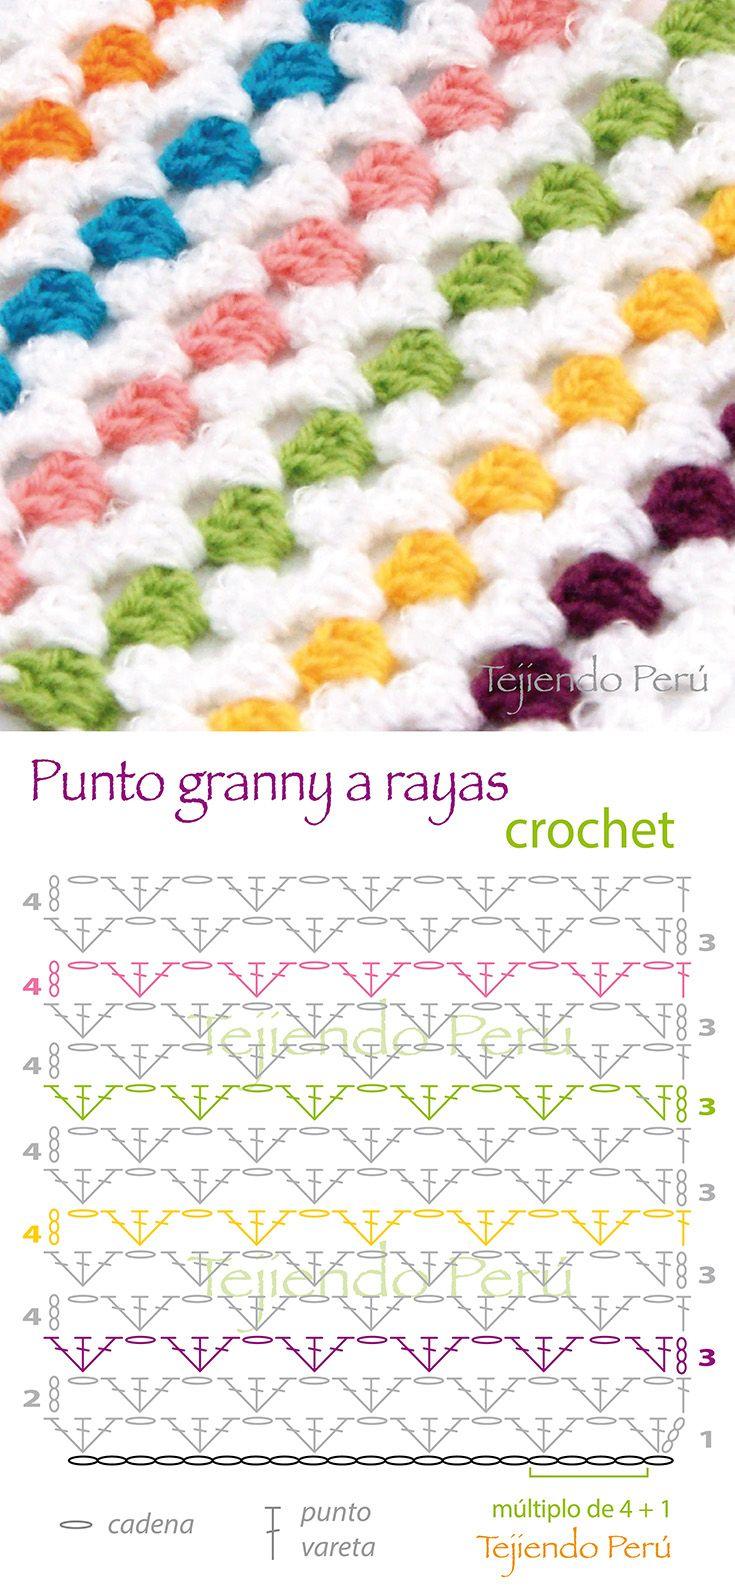 Crochet: punto granny a rayas! Diagrama de este versátil punto que ...